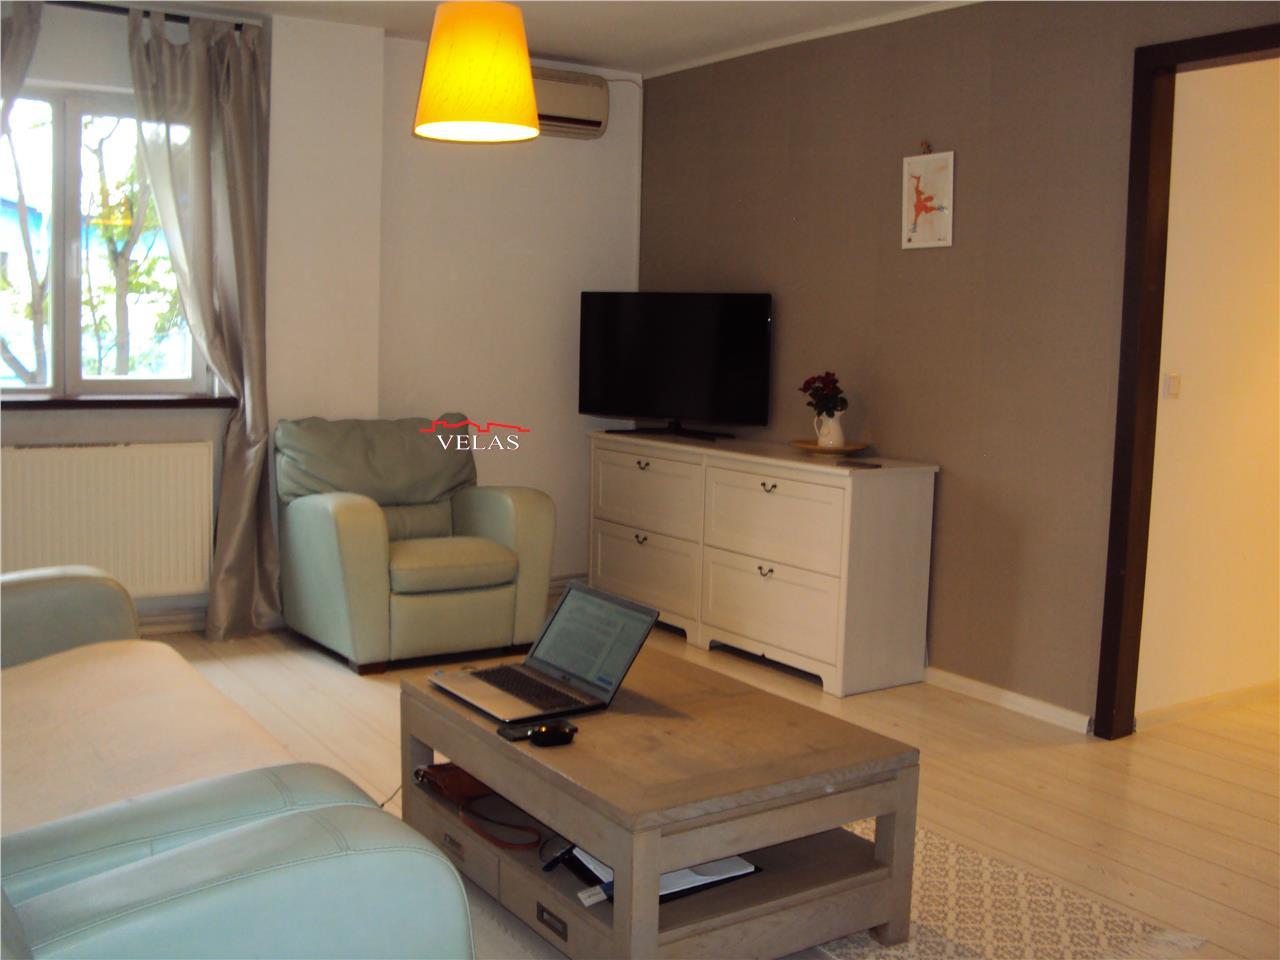 Apartament 3 camere, et 1, CT, mobilat , Bdul Bucuresti